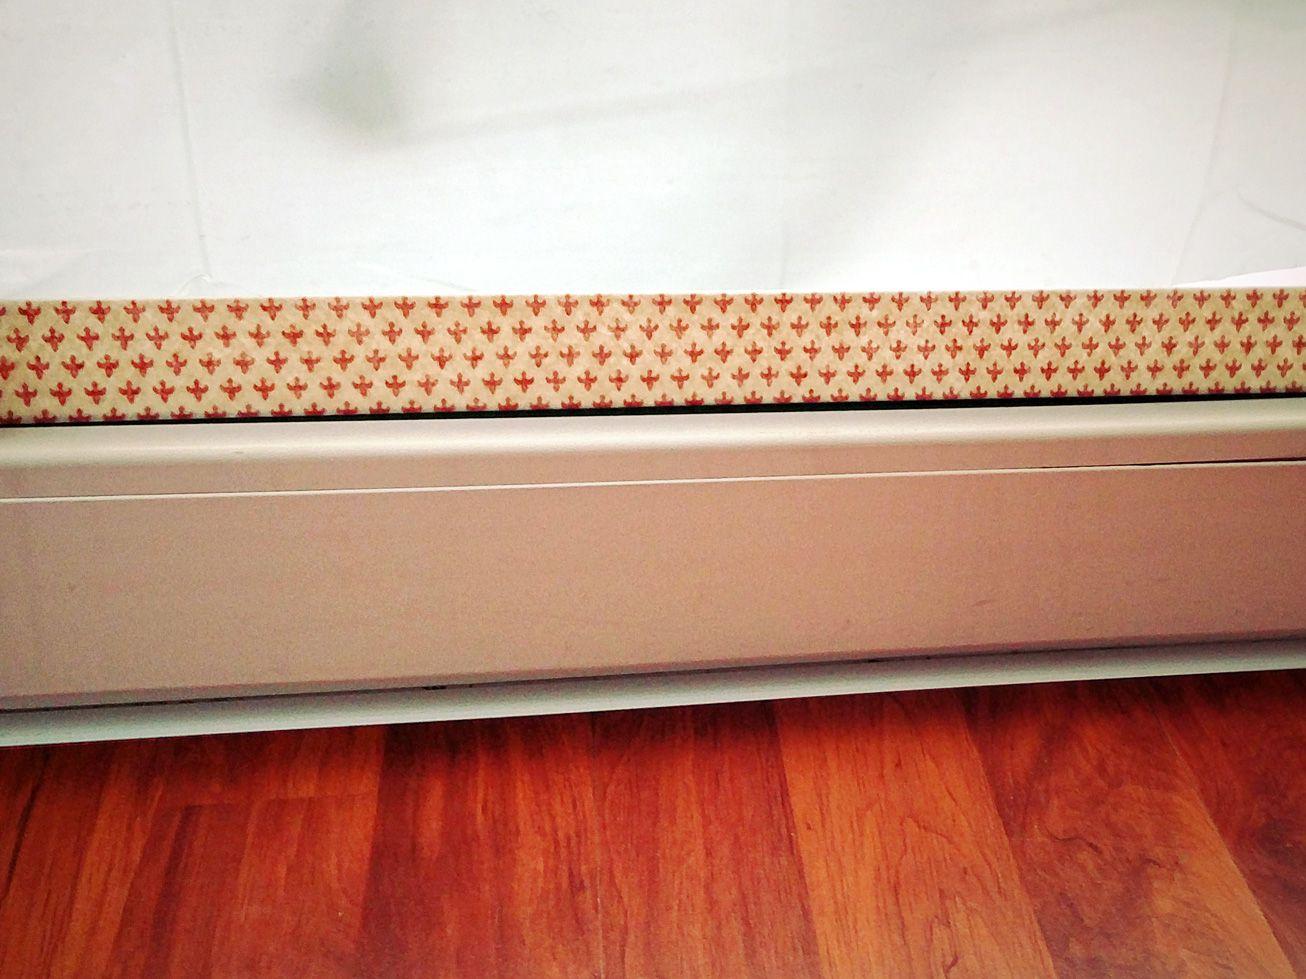 Cseppmentes teraszajt condensation free glass patio door cseppmentes teraszajt condensation free glass patio door window condensation solution planetlyrics Choice Image